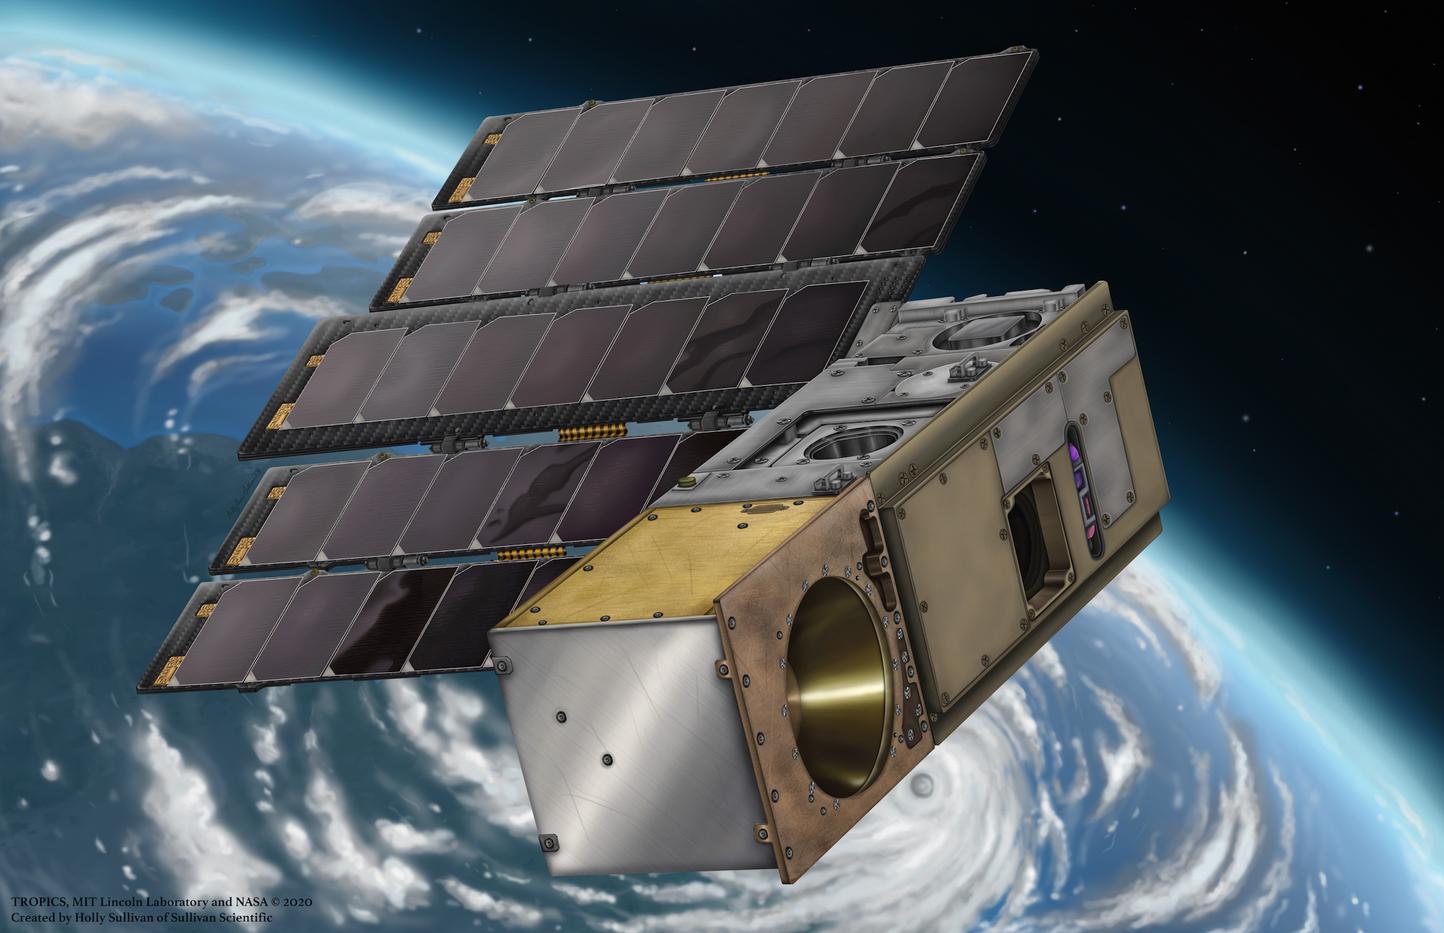 TROPICS NASA Orbit Illustration